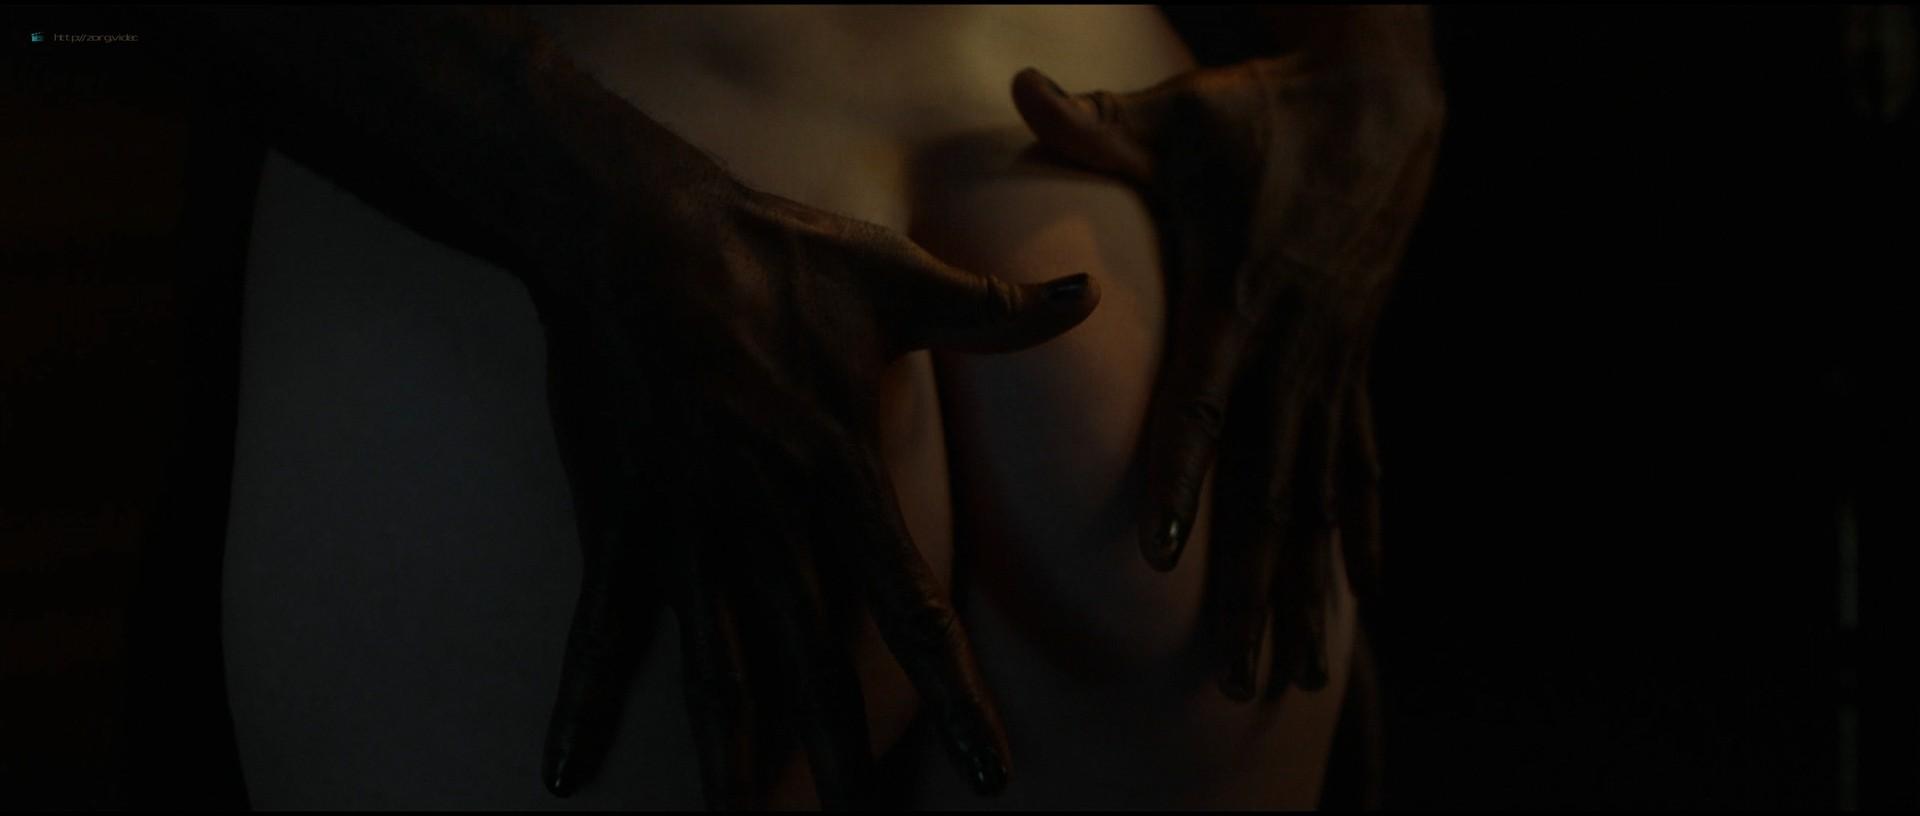 Cara Delevingne nude topless Tamzin Merchant nude sex Karla Crome sexy - Carnival Row (2019) s1e4-8 HD 1080p (6)